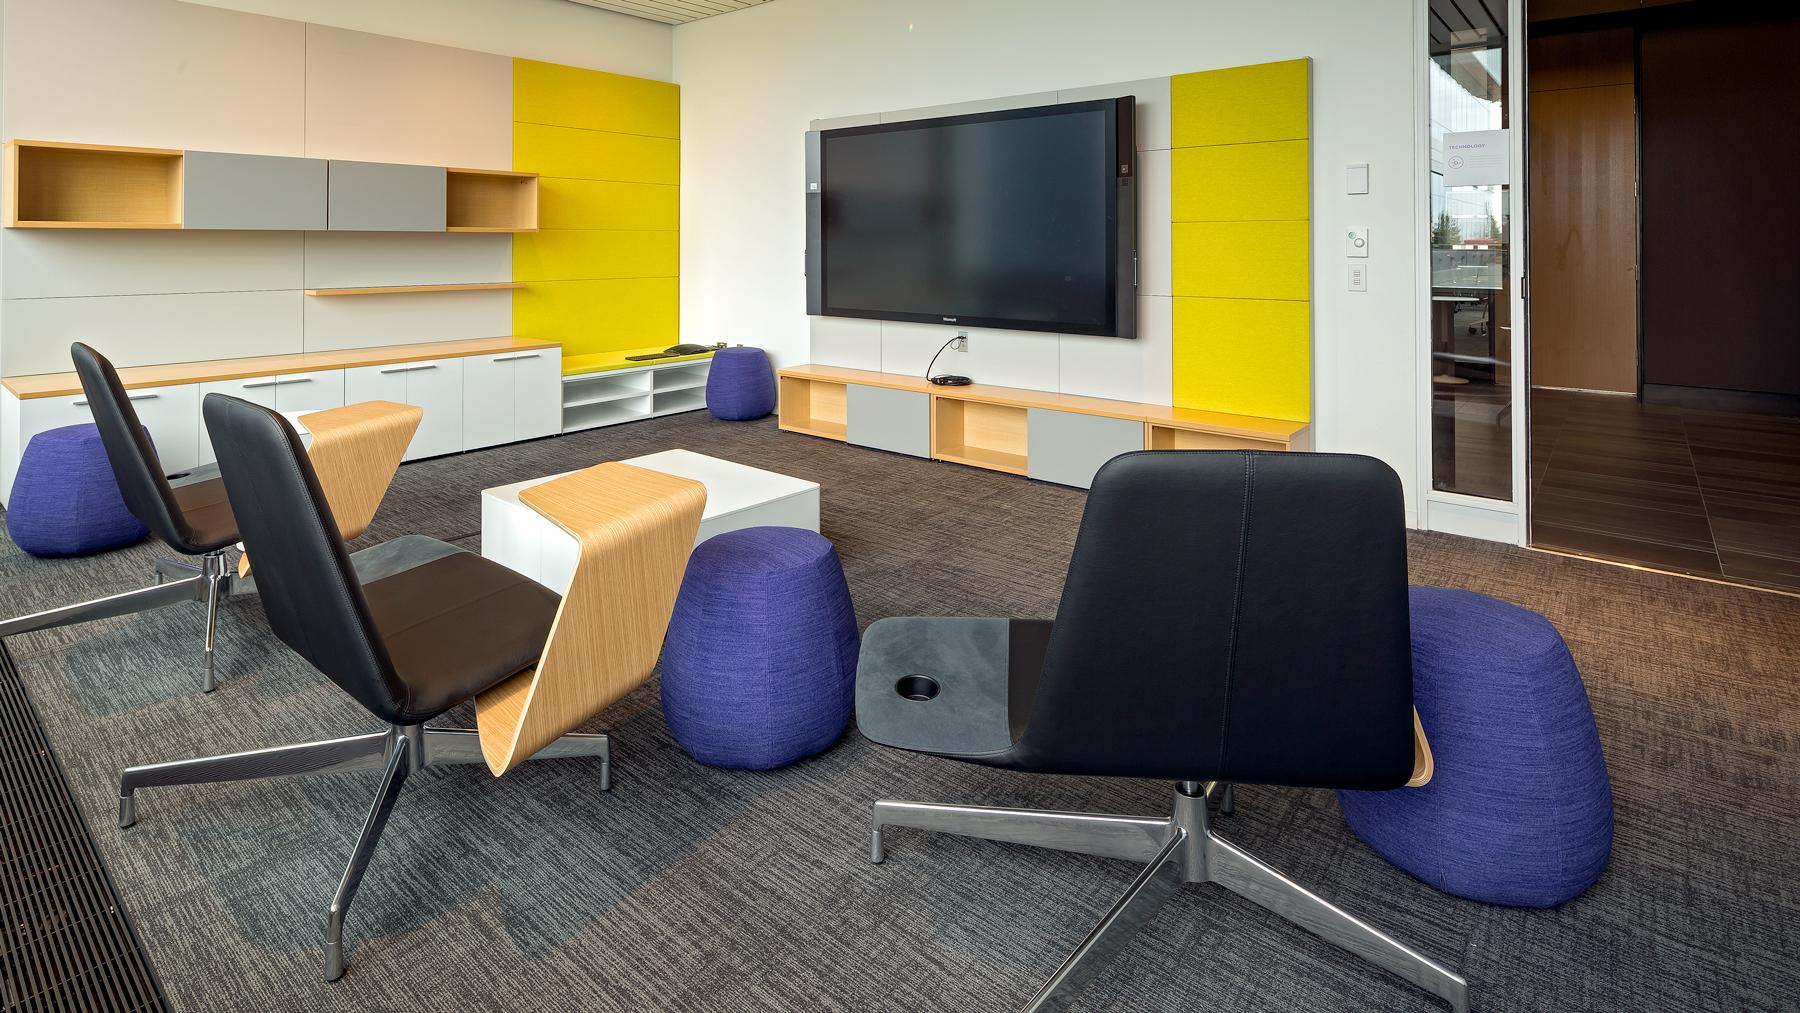 Room 1425 Design Studio